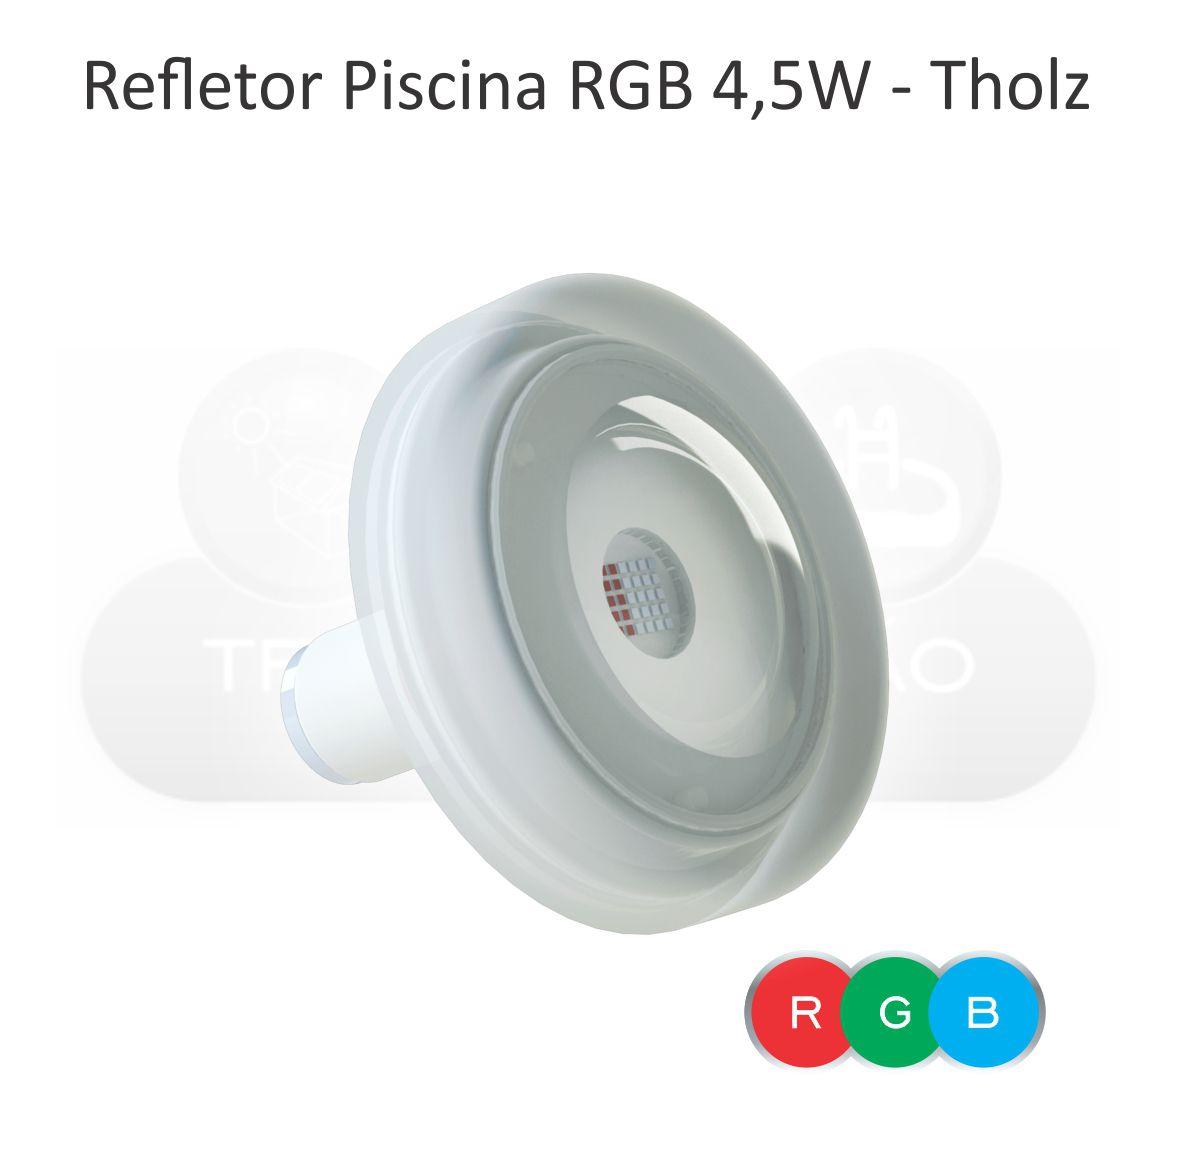 Kit Iluminação Piscina - 2 Leds Rgb 4,5w Tholz + Basic Timer 14w